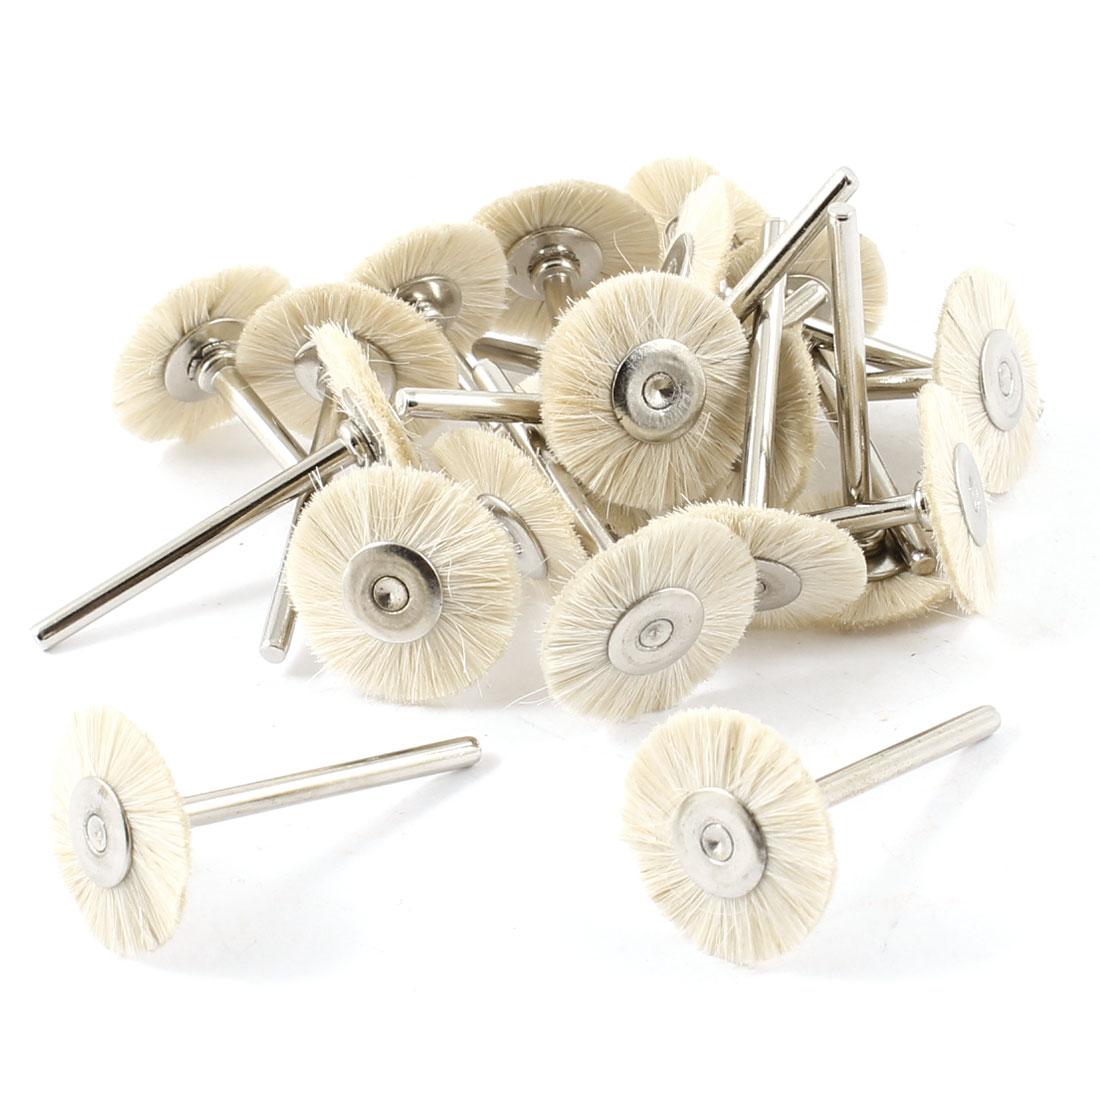 10 Pairs T Shaped Beige Nylon Metal Shank Polishing Brush Wheel